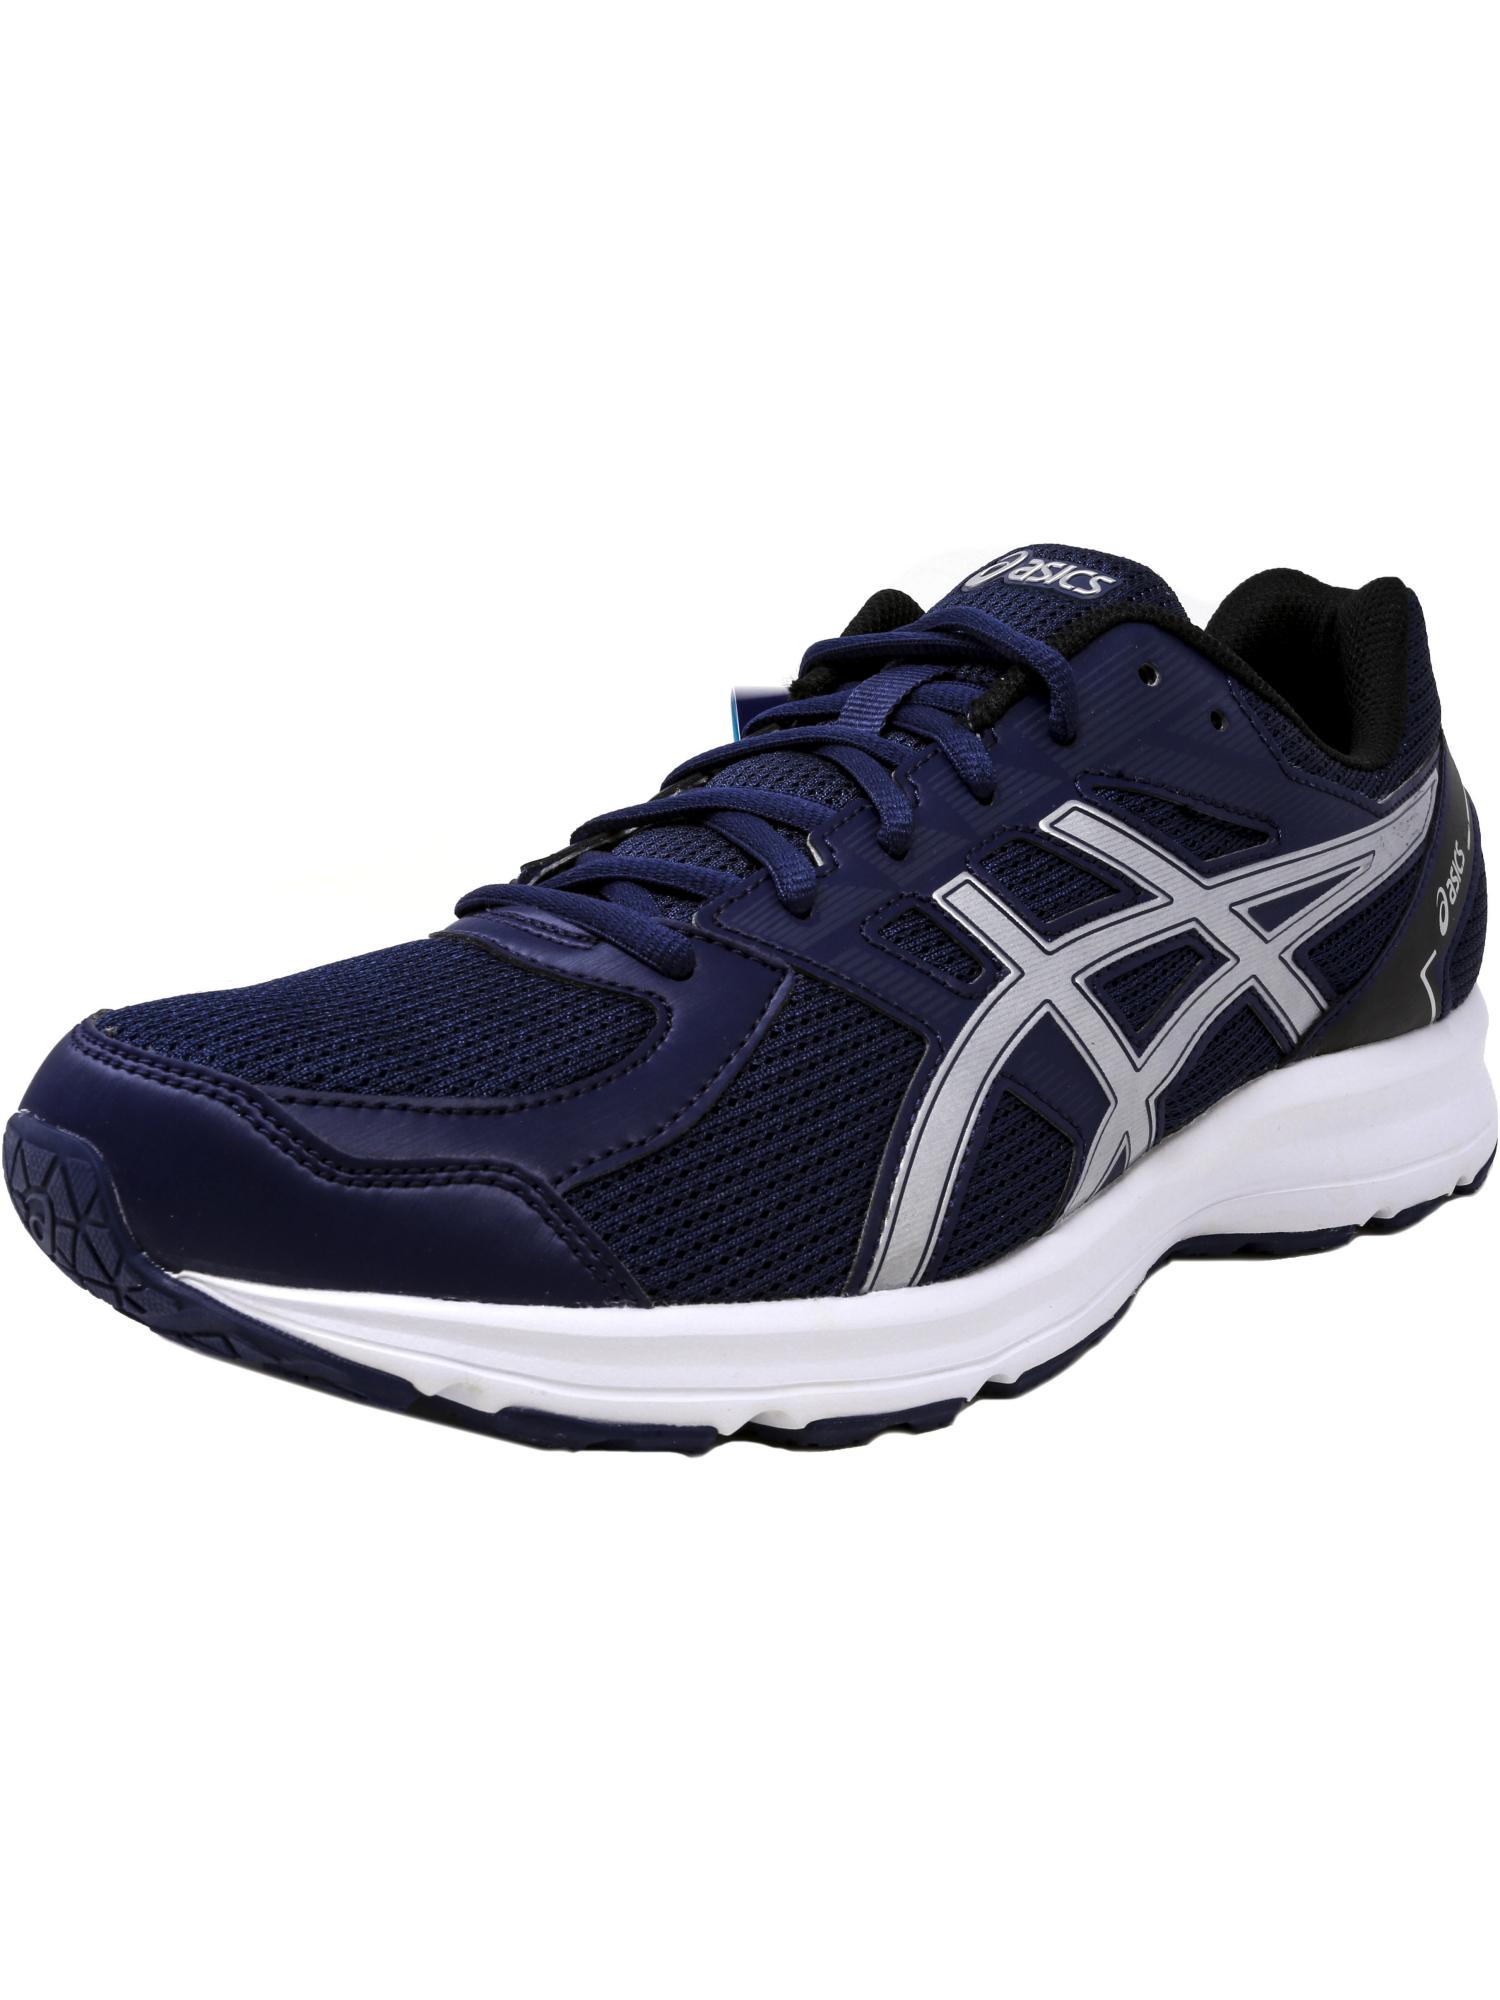 87a73c3bc7 ... Mr Ms Asics Men s Jolt Ankle-High Running Running Running Shoe  Promotion In short ...